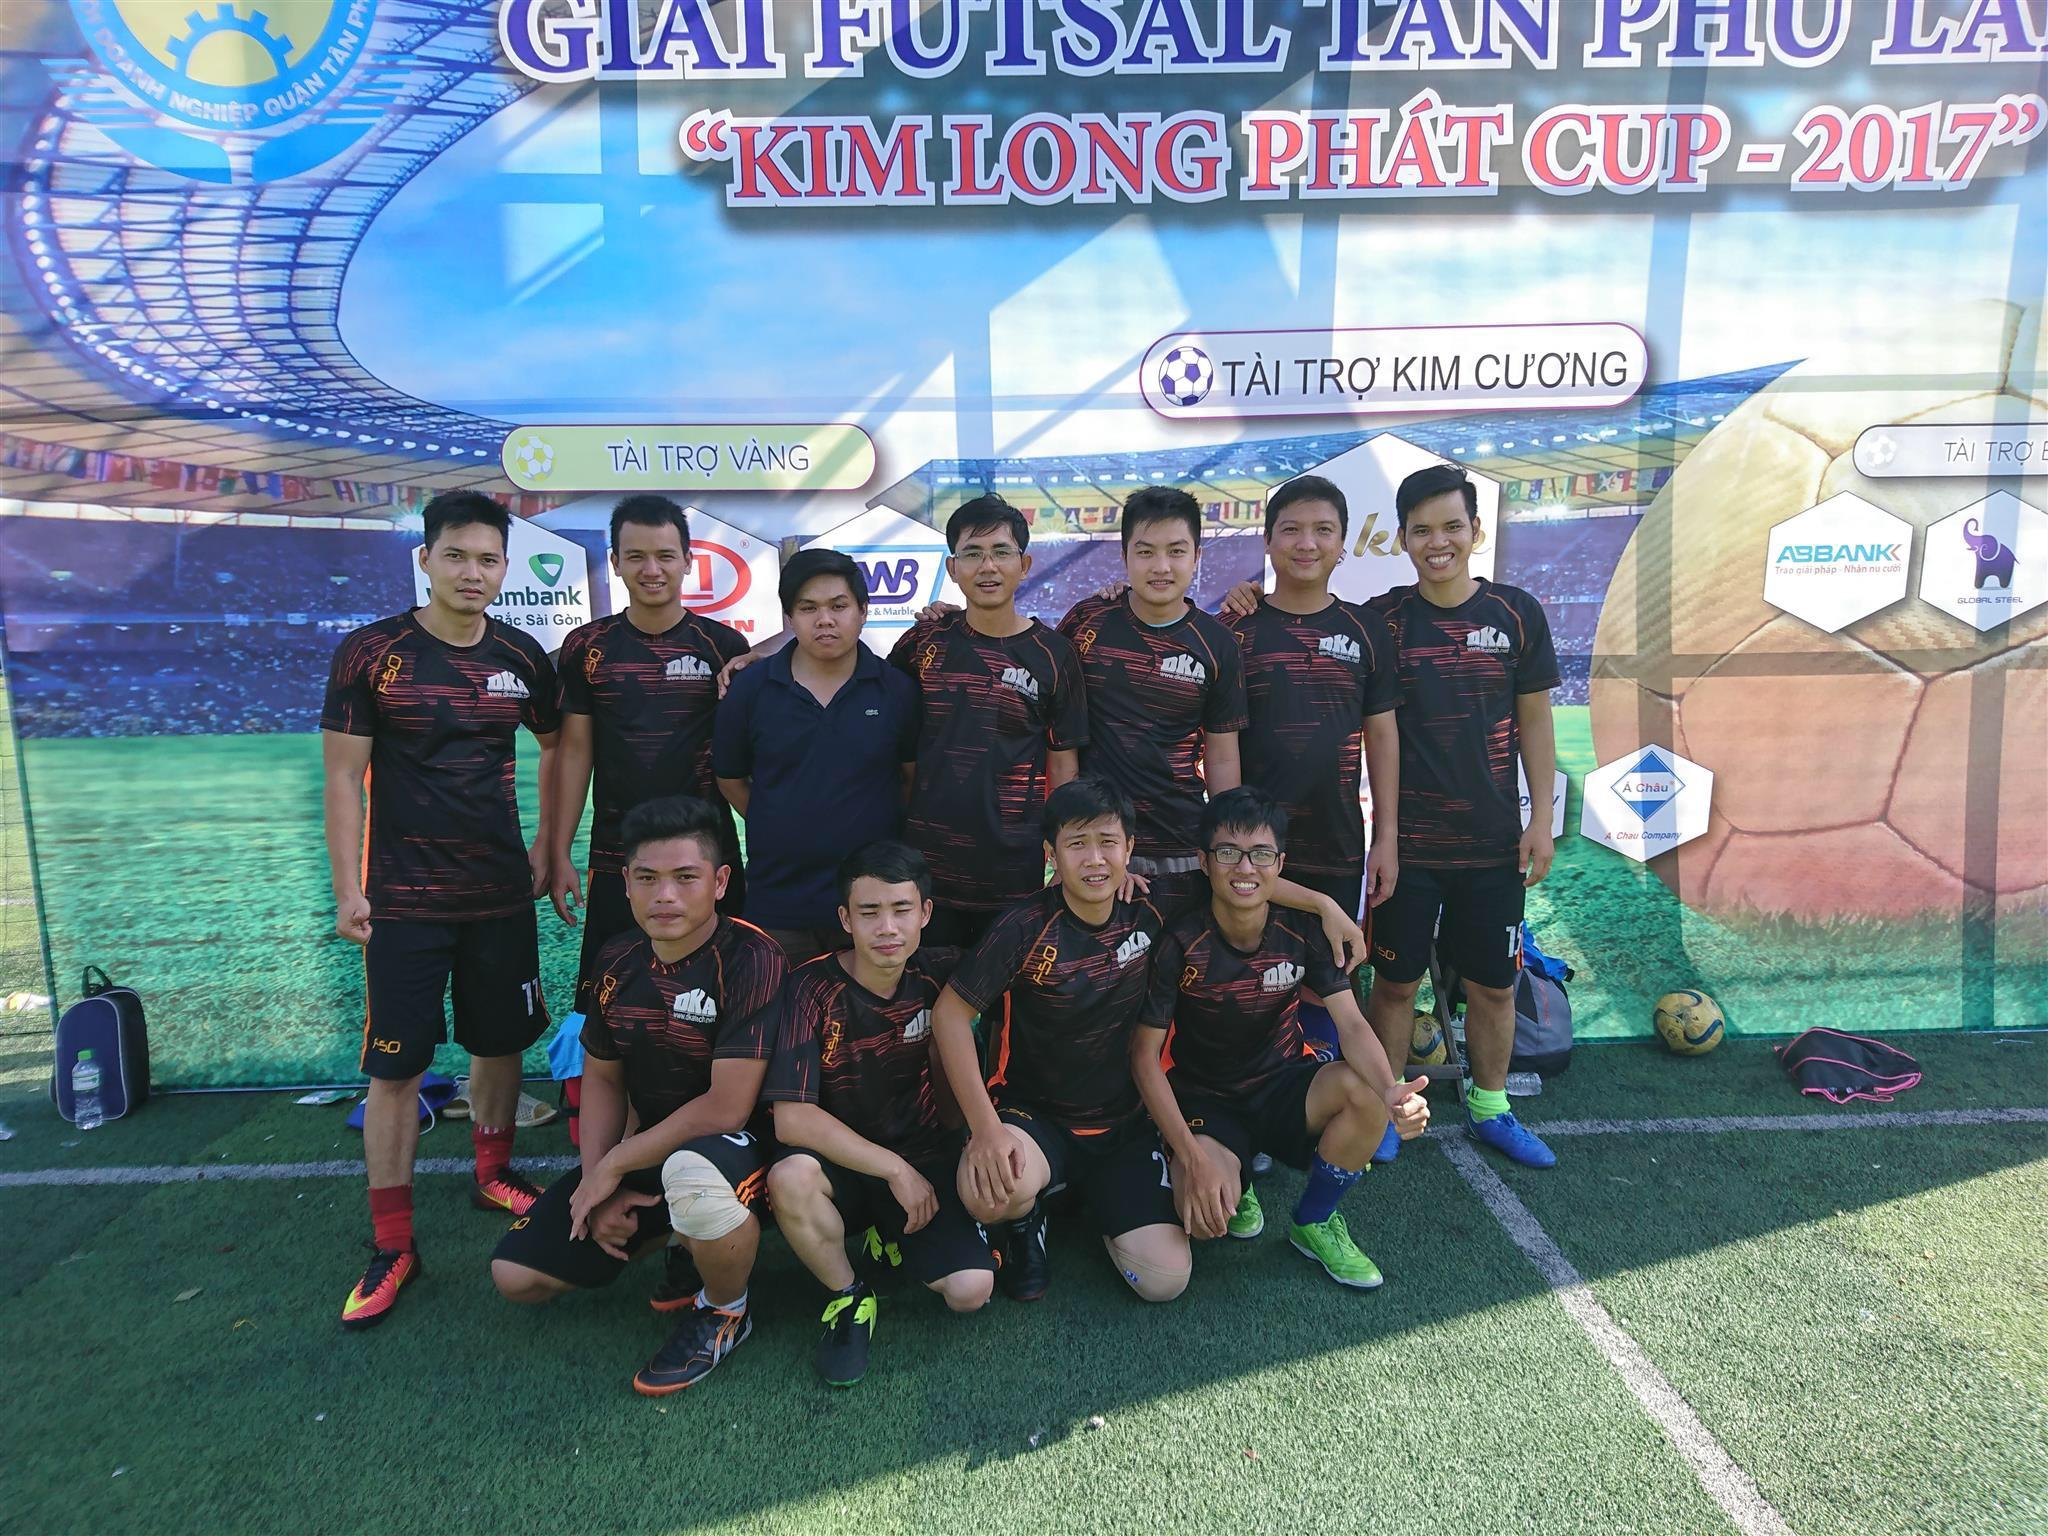 DKA Tham gia giải FUTSAL Tân Phú